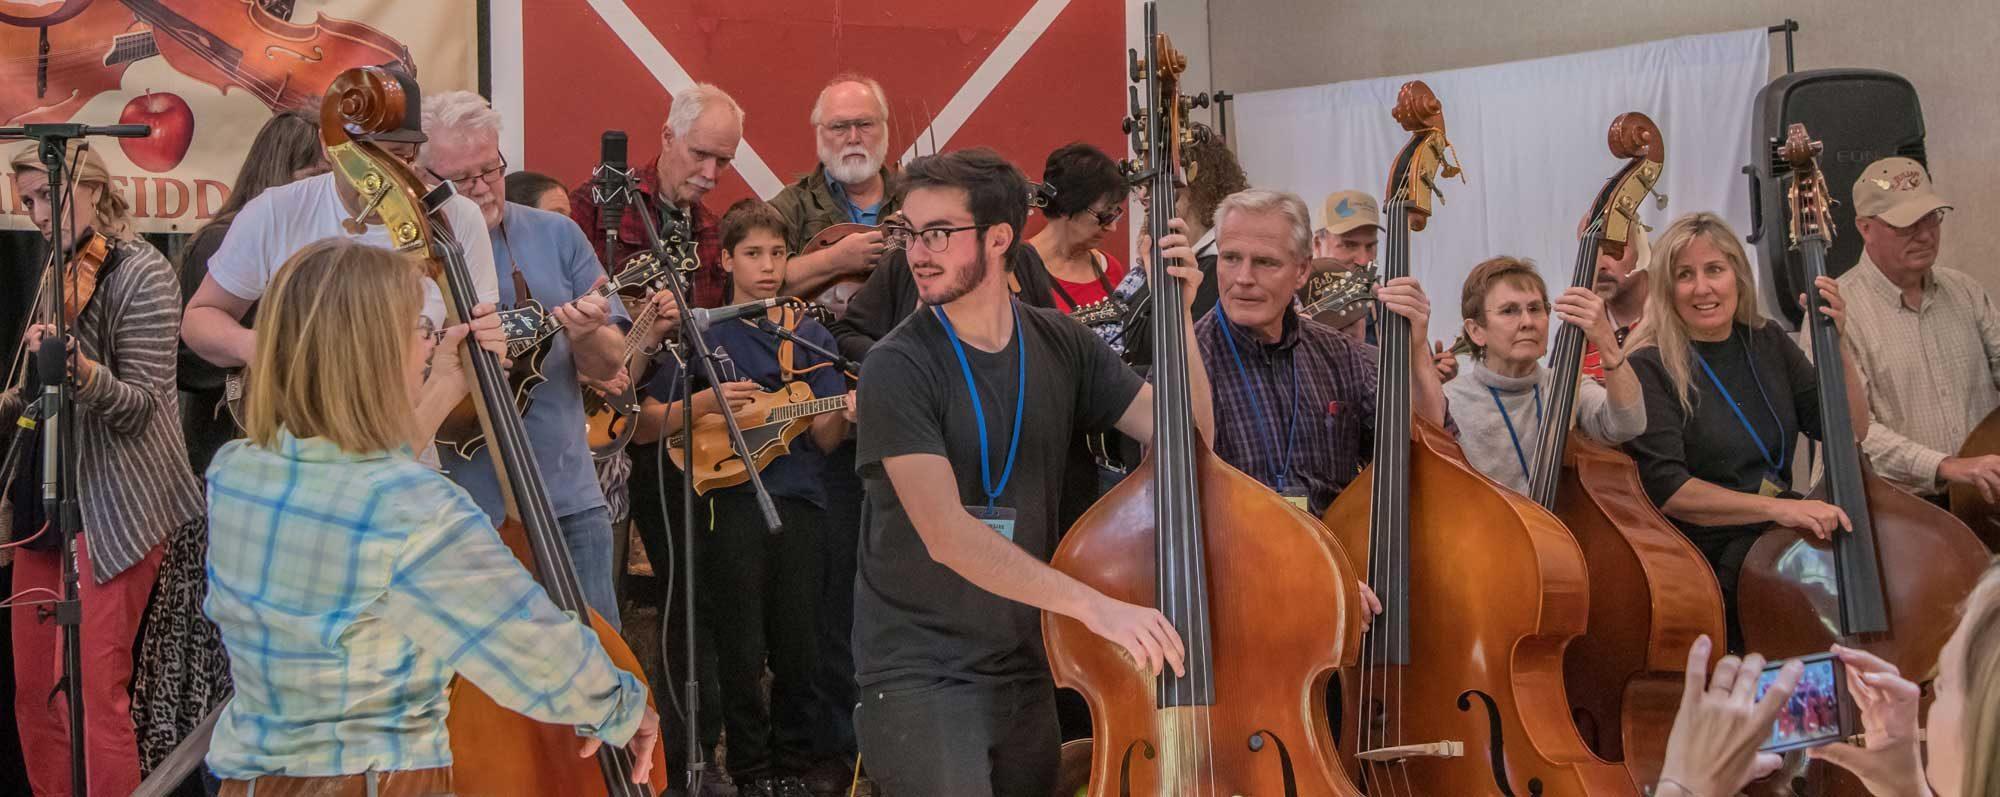 Max Schwartz at Julian Fiddle Camp